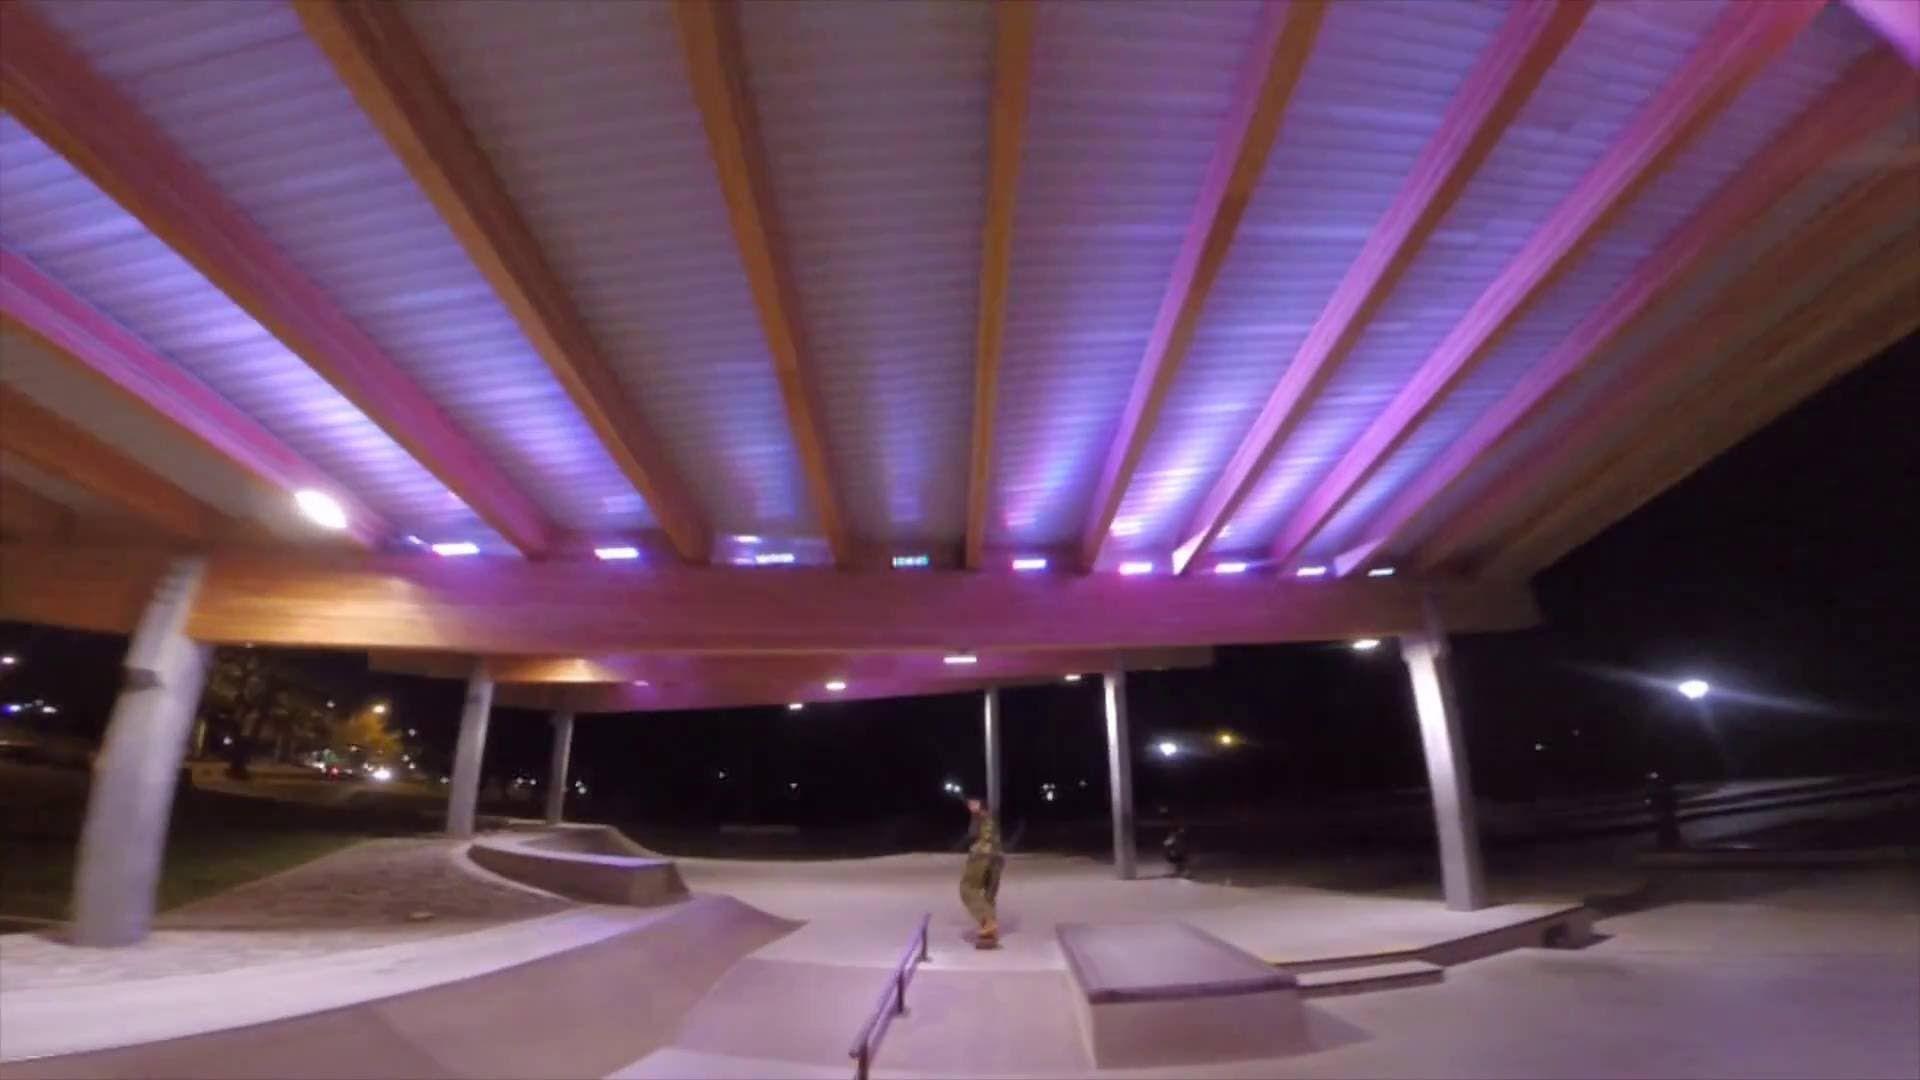 Vortex 250 pro - Cloverdale skatepark @ night